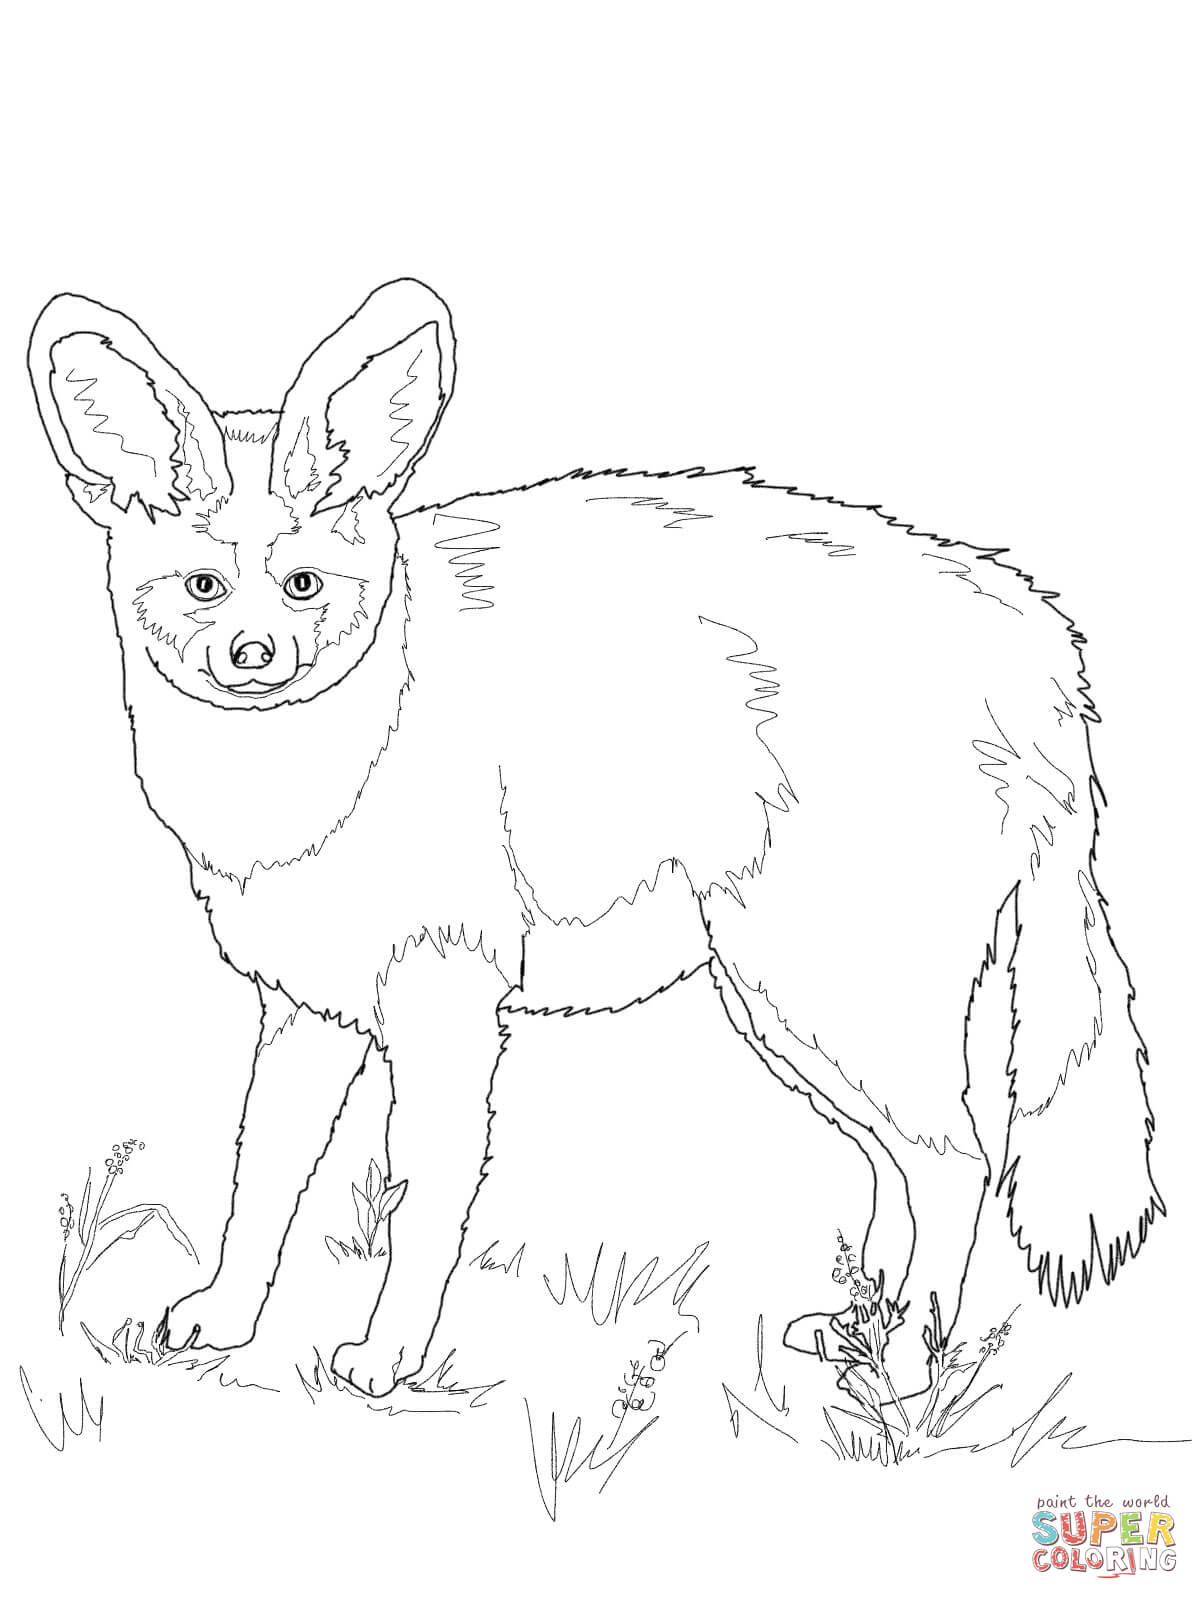 Bat-Eared Fox clipart #17, Download drawings